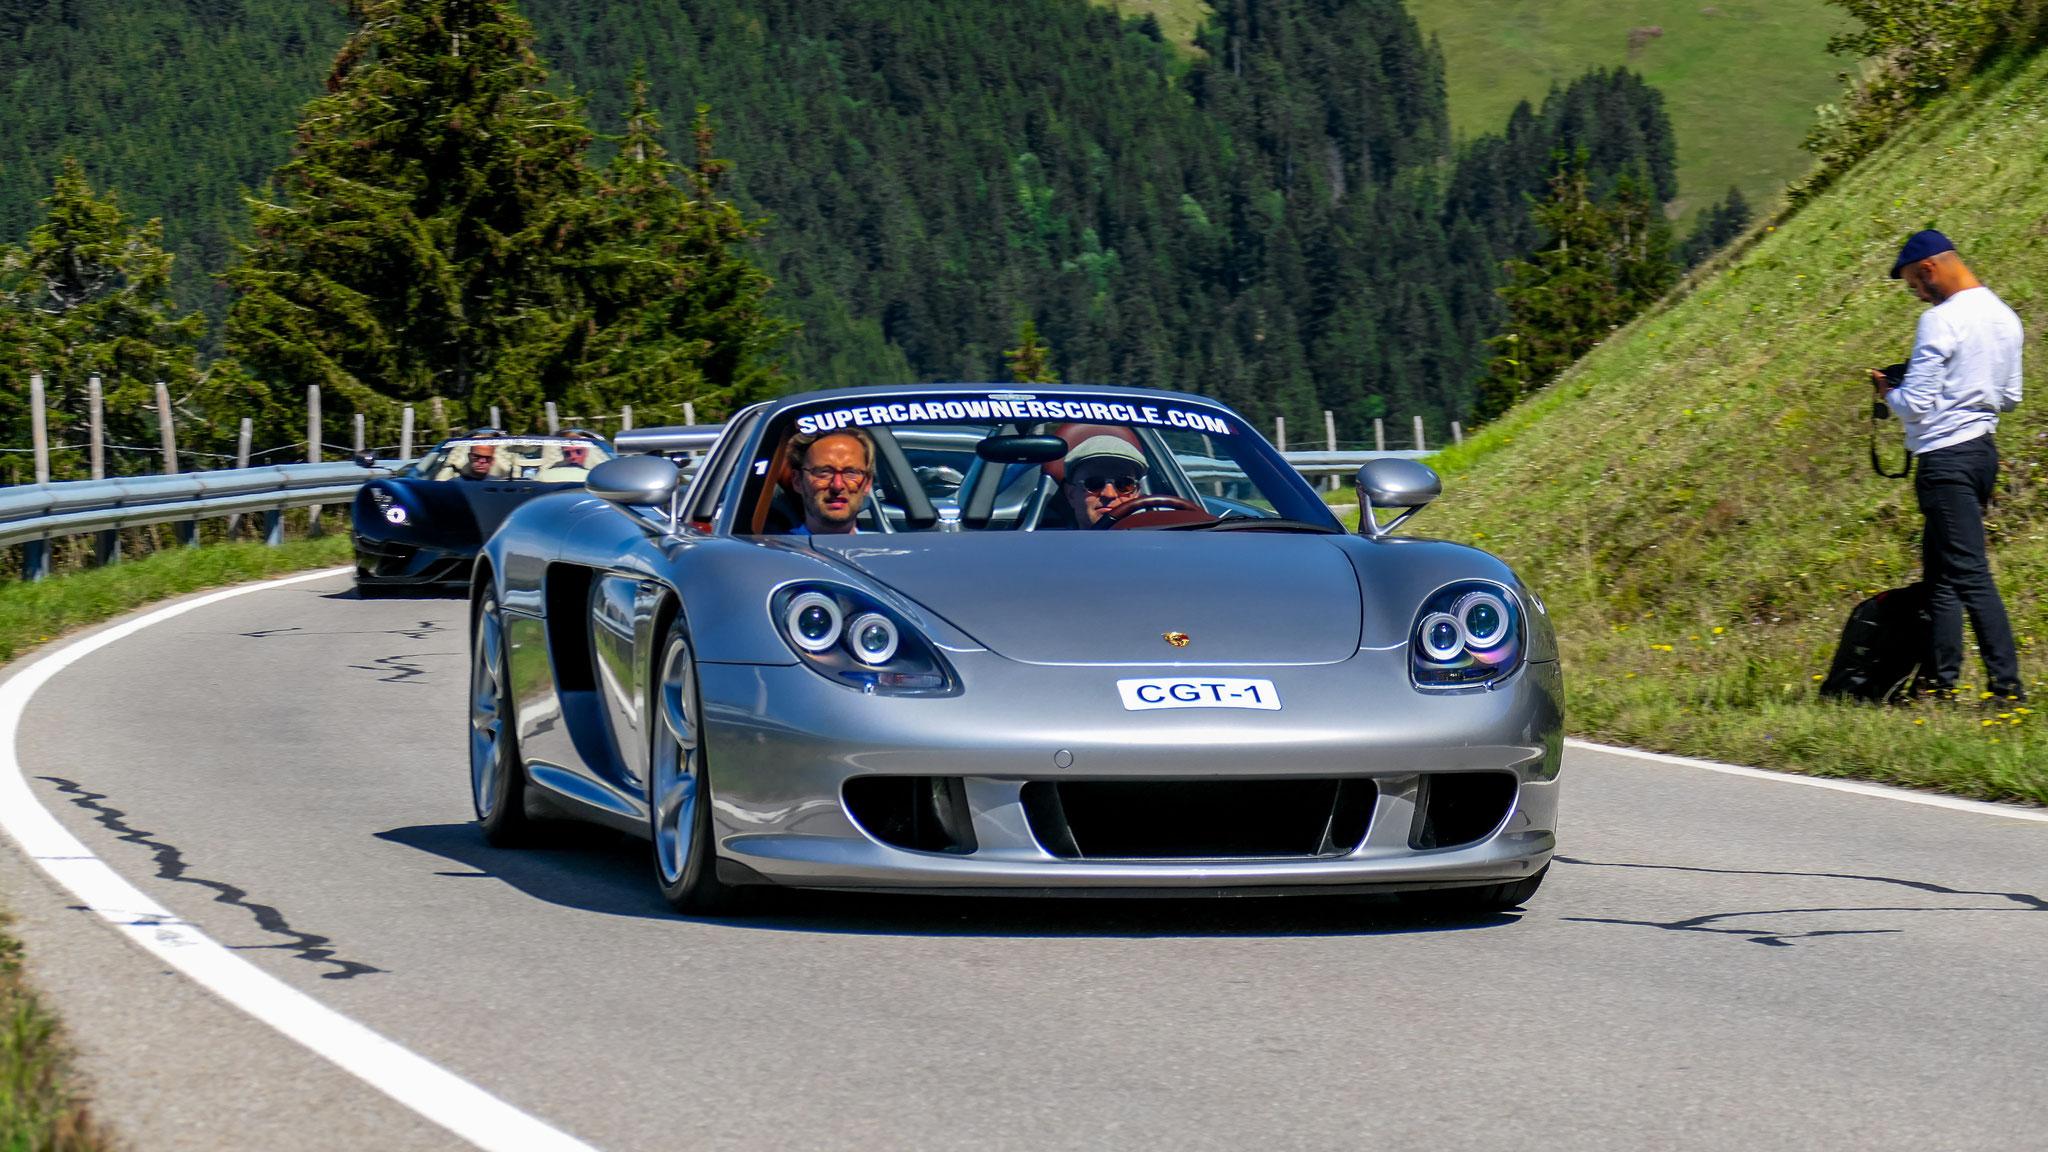 Porsche Carrera GT - CGT-1 (GB)